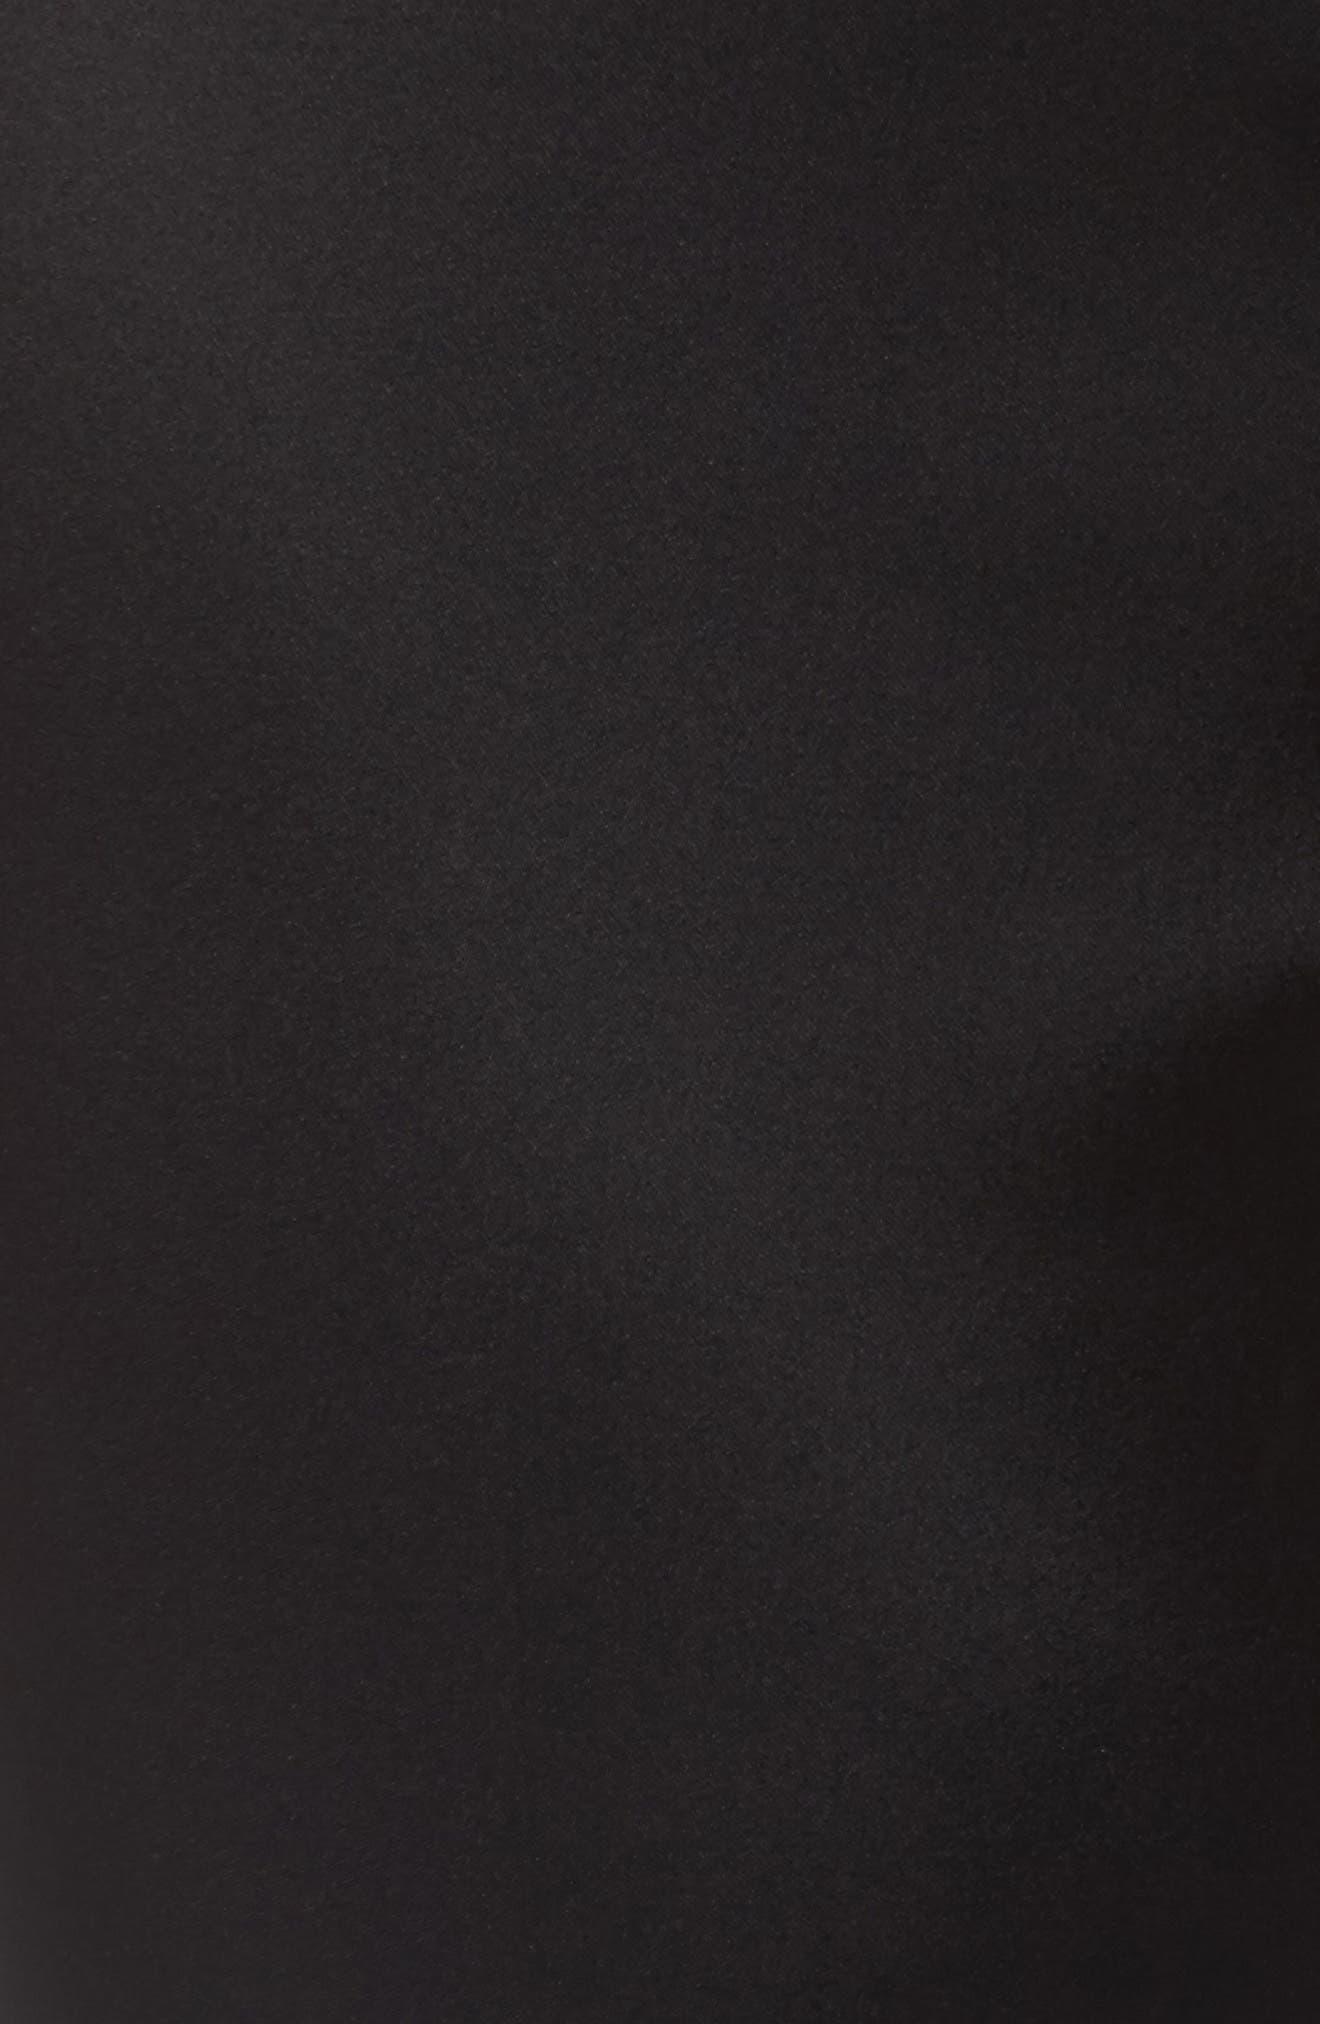 Stretch Satin Skinny Trousers,                             Alternate thumbnail 5, color,                             Black